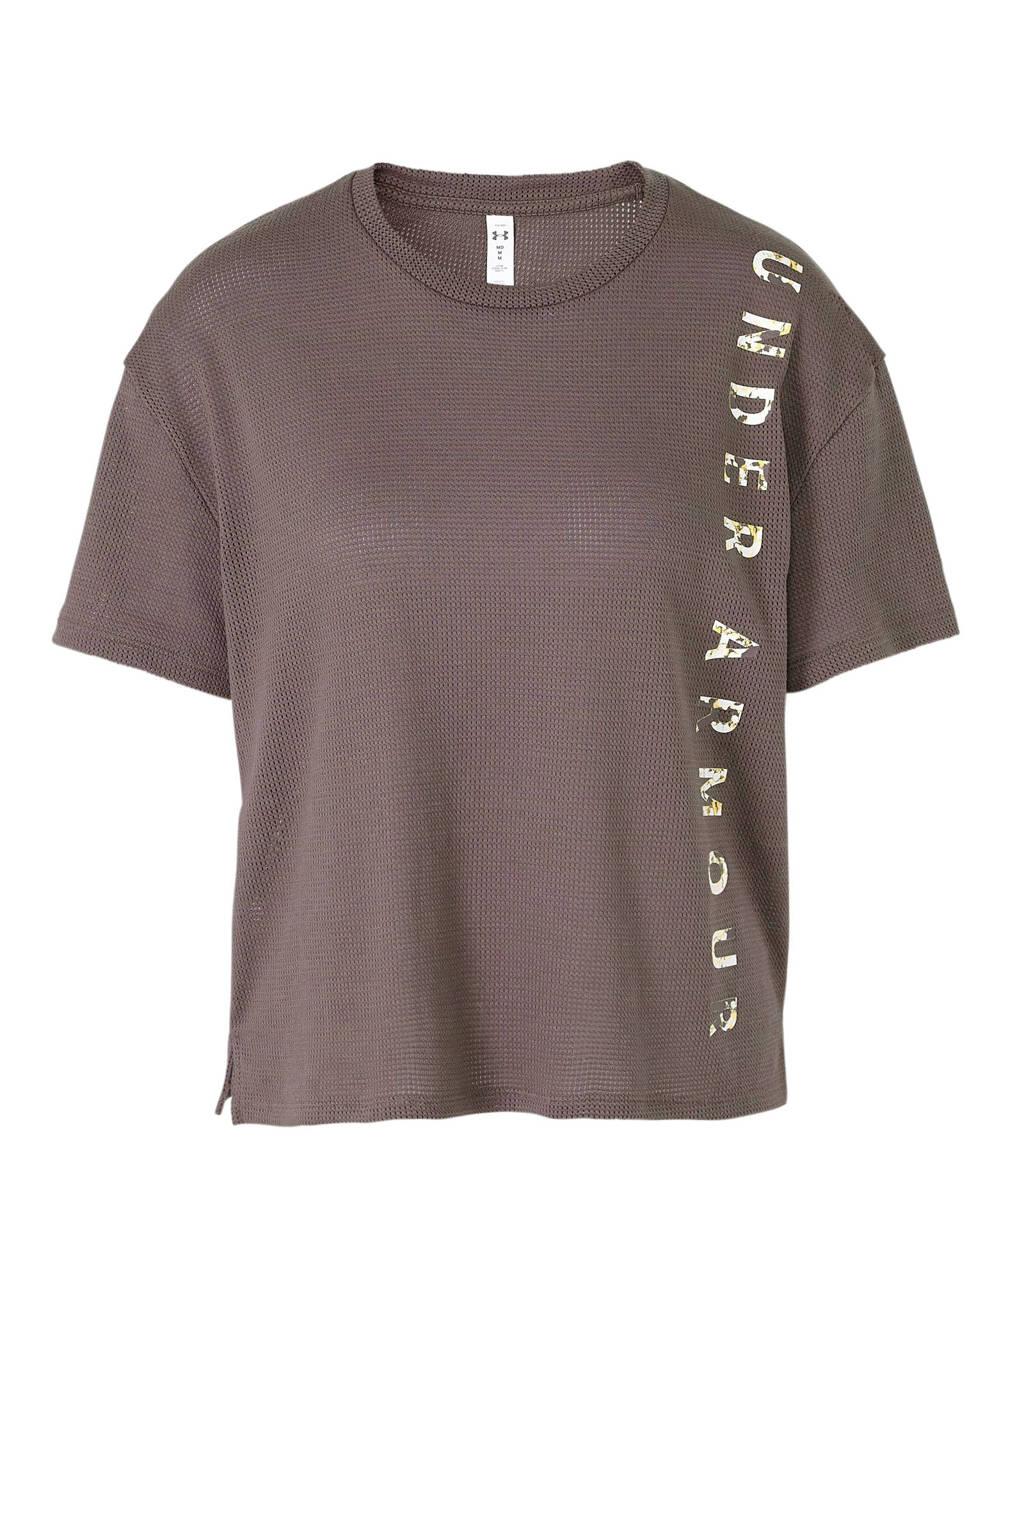 Under Armour sport T-shirt grijs, Taupe